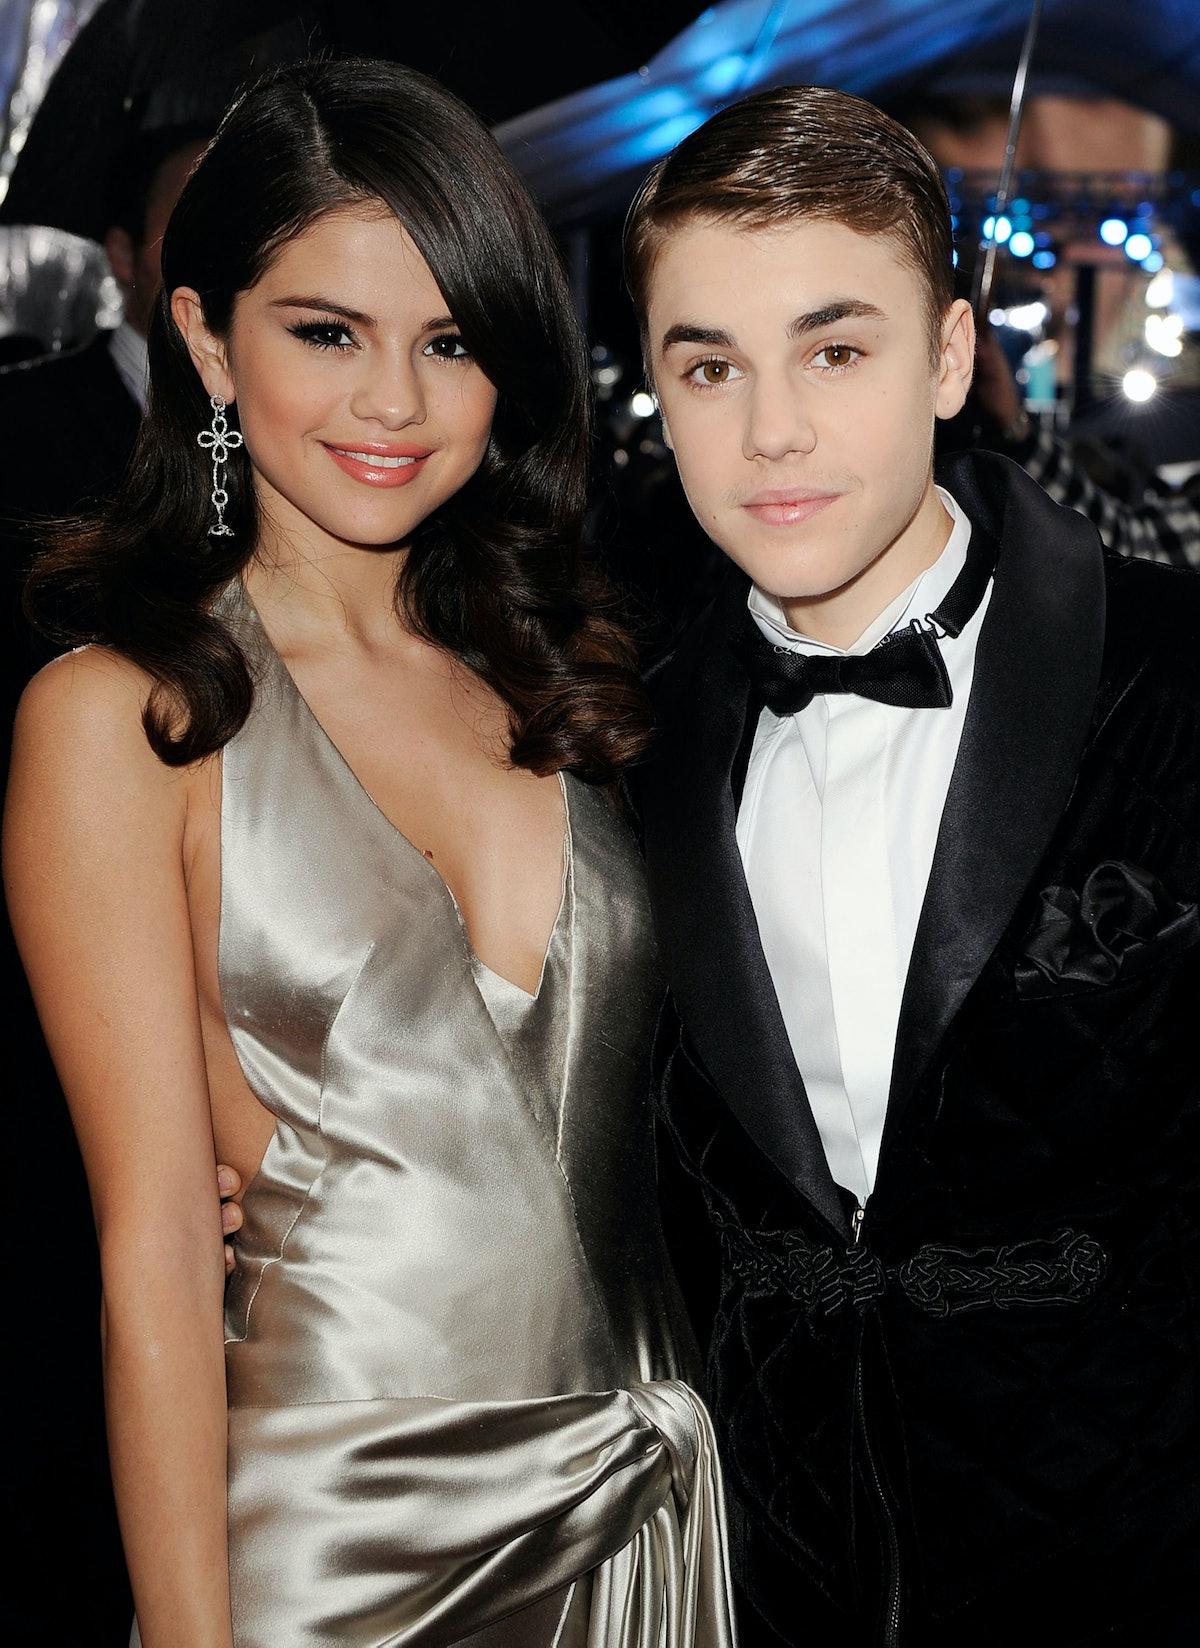 LOS ANGELES, CA - NOVEMBER 20:  Singers Selena Gomez and Justin Bieber arrive at the 2011 American M...